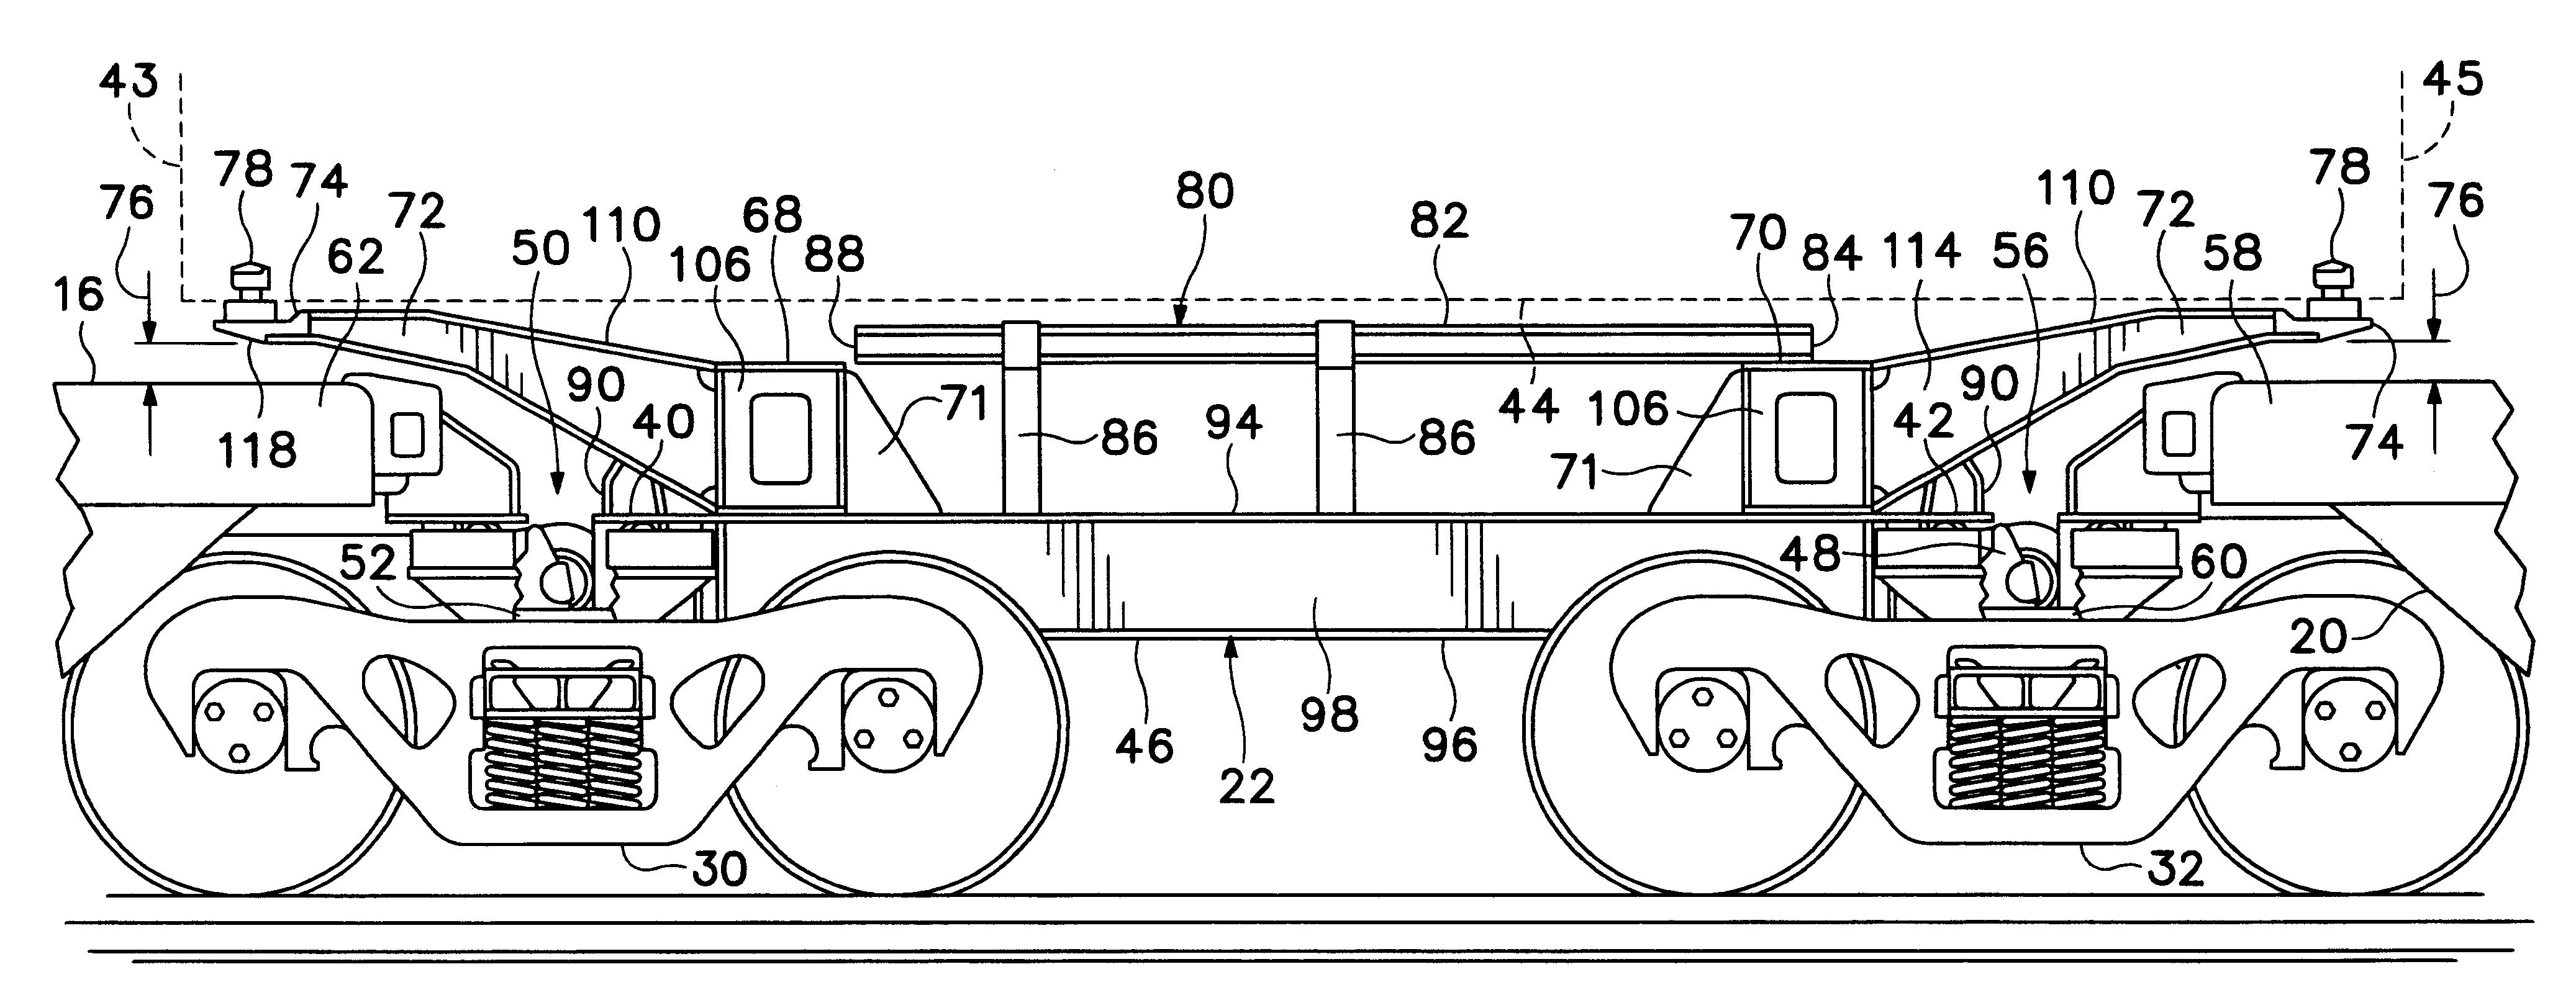 Railroad Car Drawings – HD Wallpapers